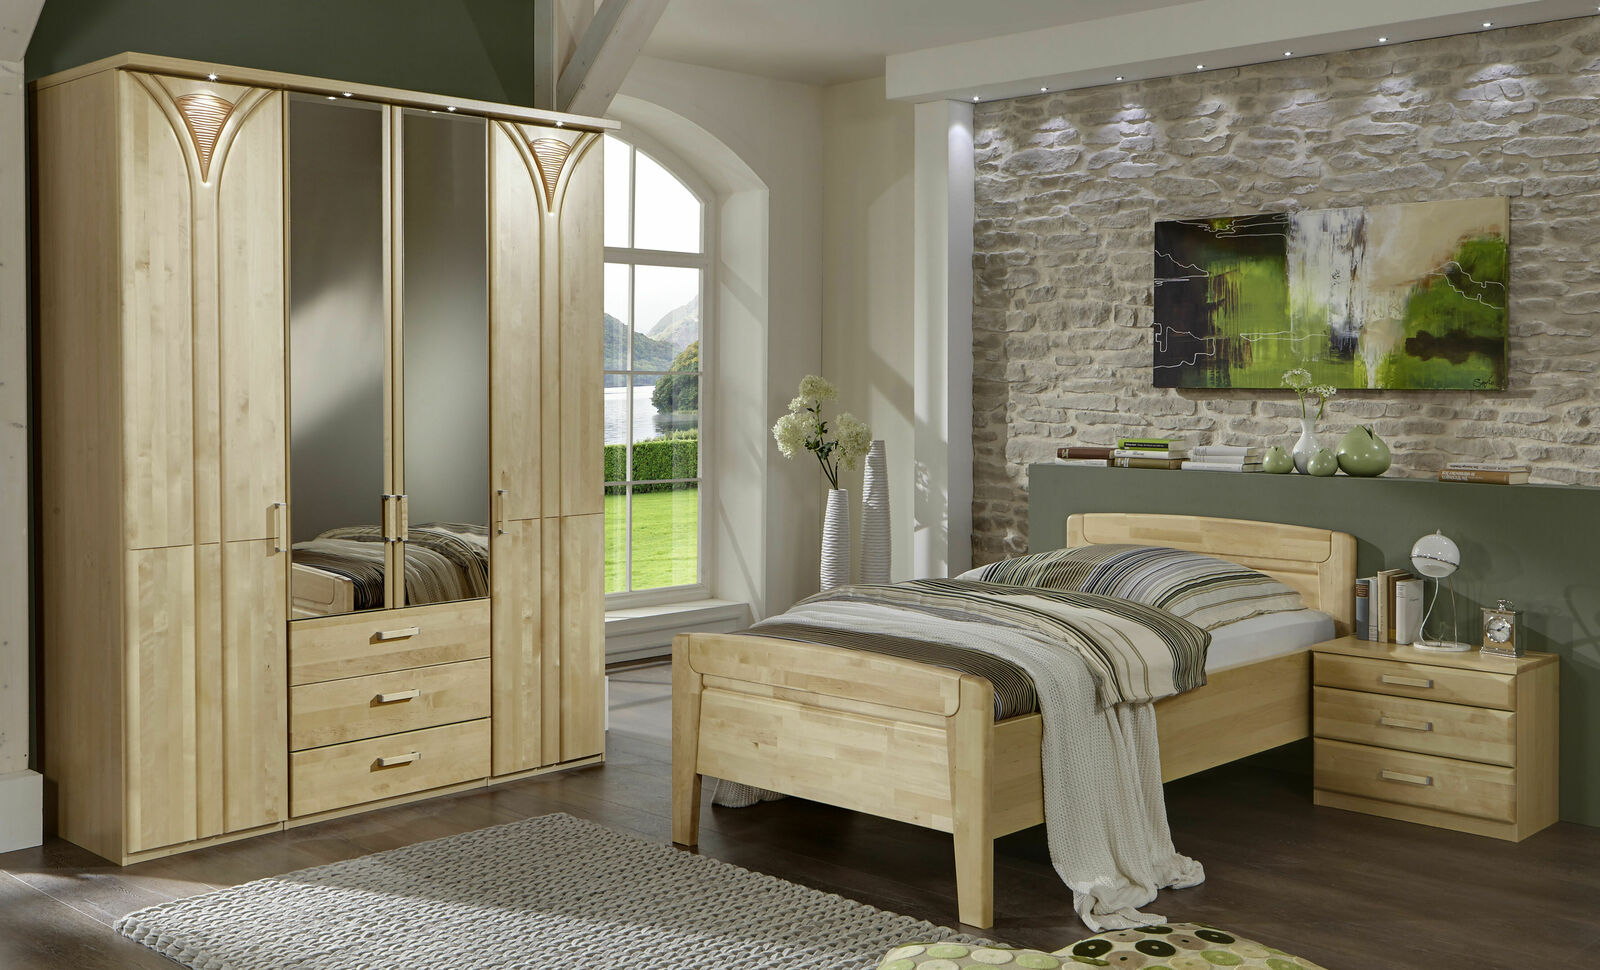 Birkenholz Eigenschaften Und Verwendung Betten De Lexikon